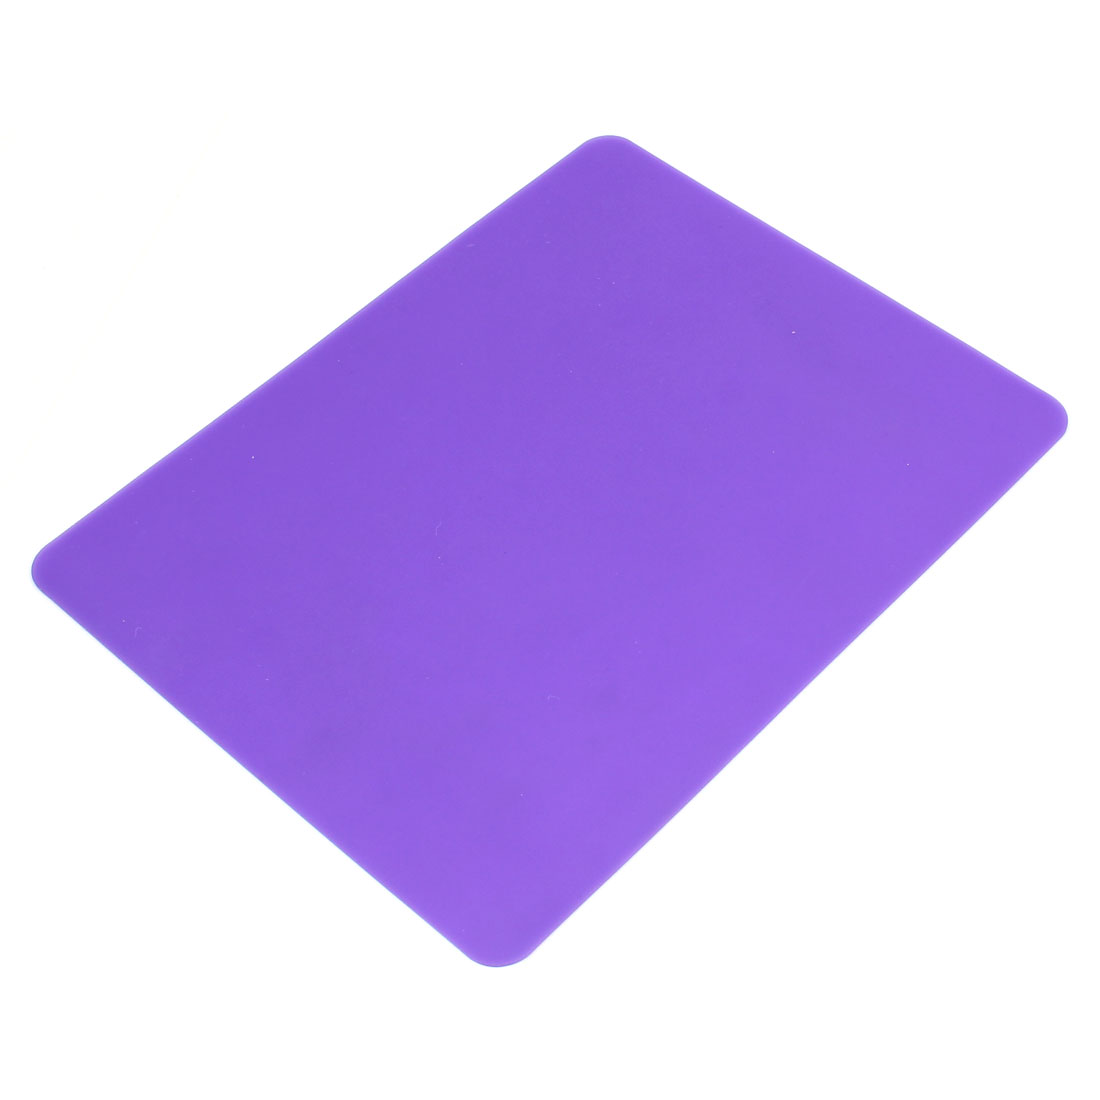 21.5 x 16.8cm Purple Anti-skid Silicone Desktop Computer Mouse Pad Mat